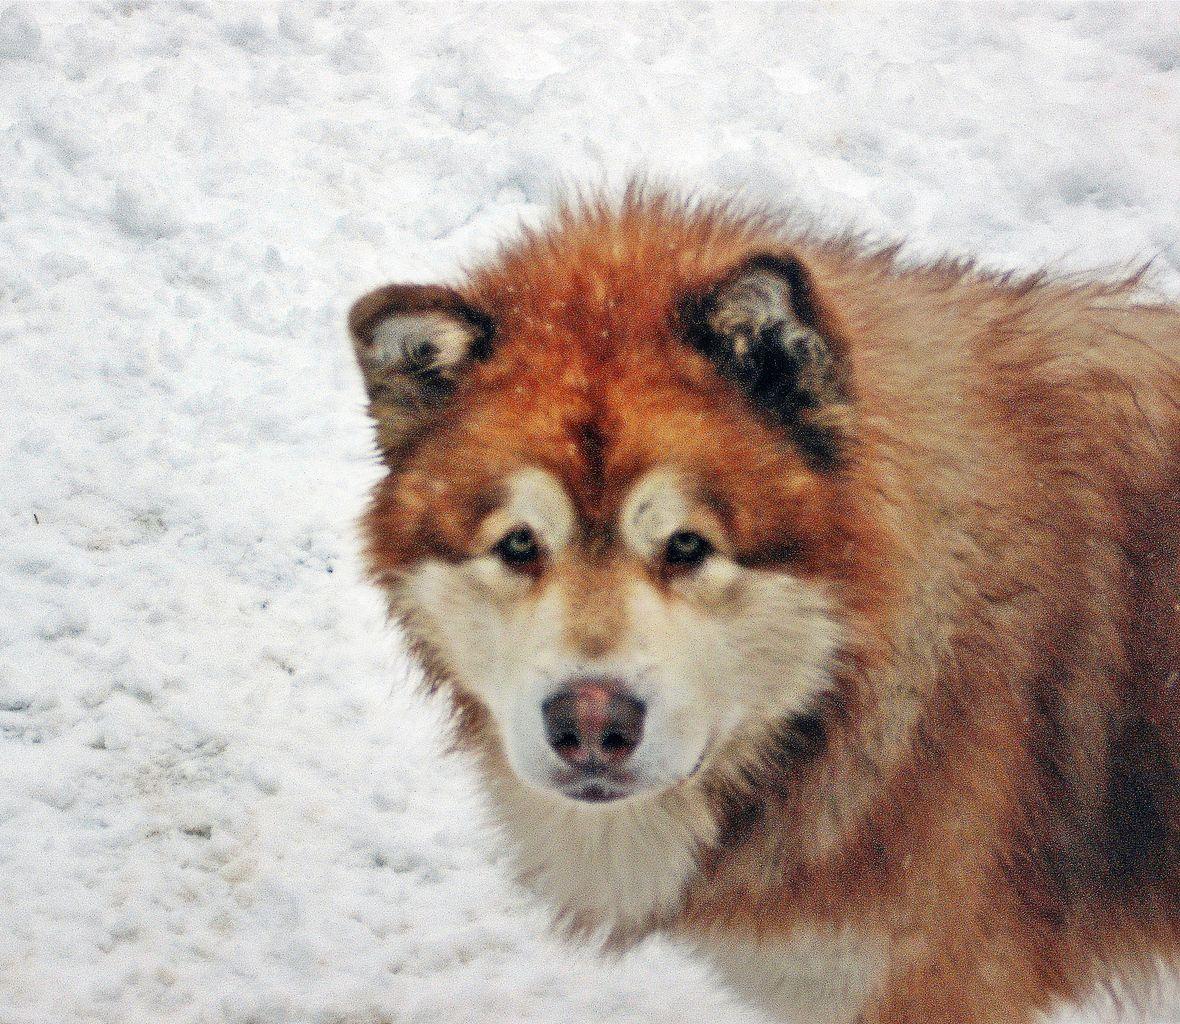 Website Owner Lookup >> Enchanted Dreams Alaskan Malamutes | Alaskan Malamute Breeder | Smyrna, New York